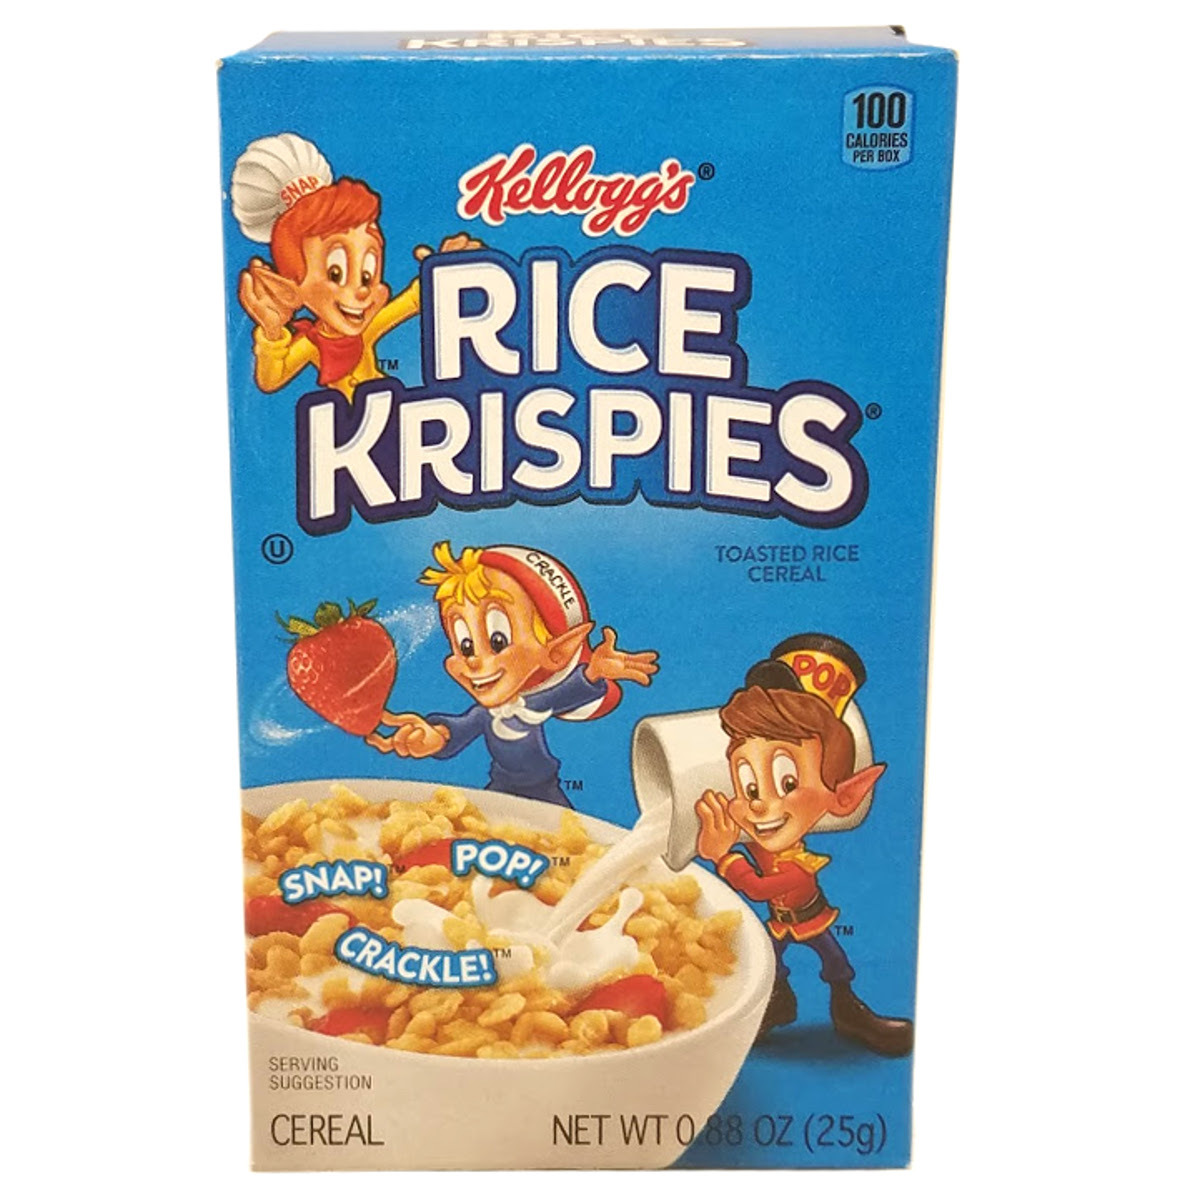 Wholesale Kelloggs Rice Krispies Cereal (box) (SKU 362355